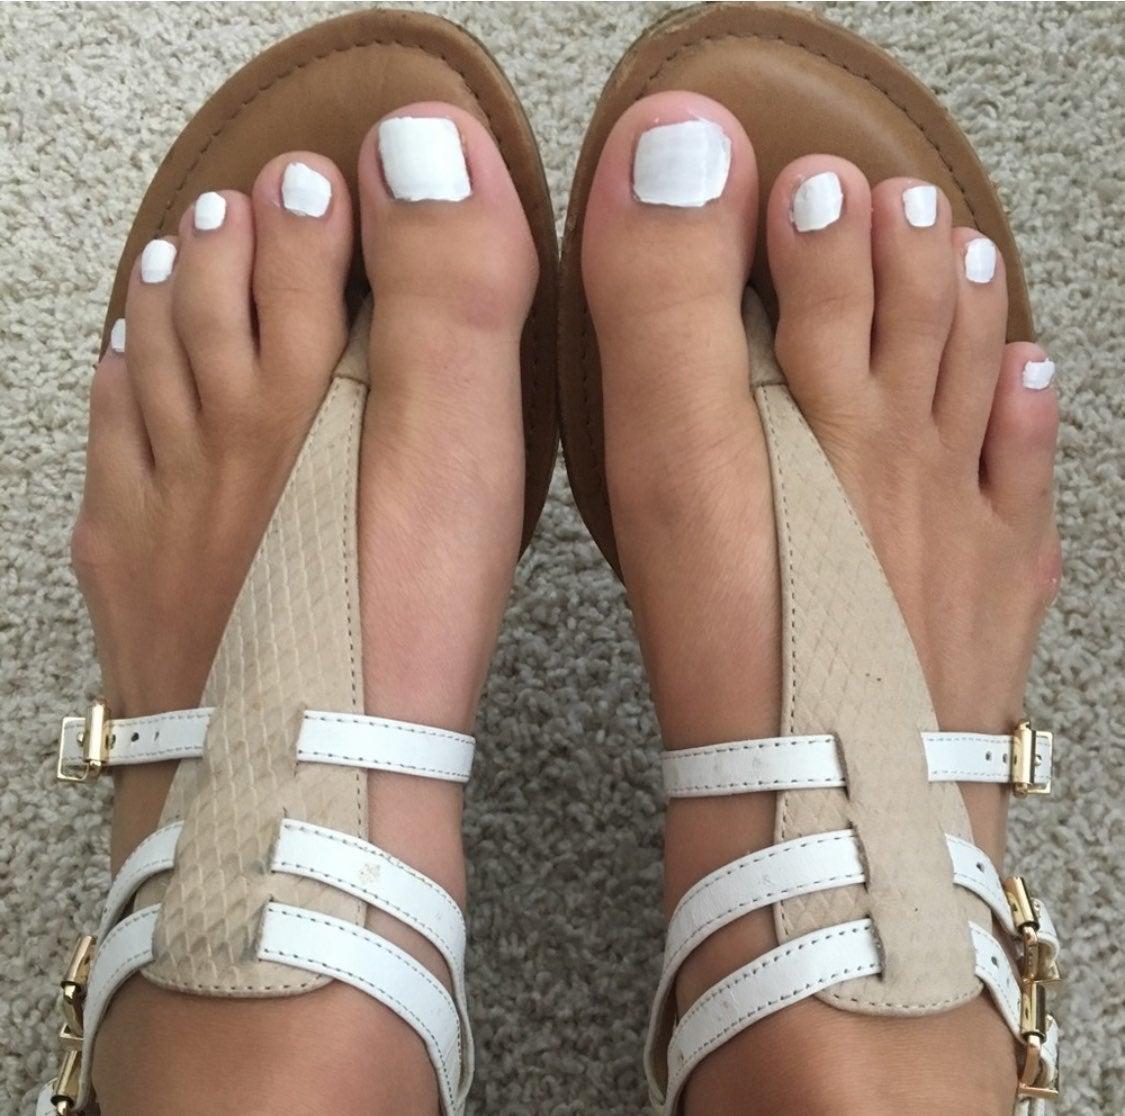 Gianni Bini Cream and White Sandals